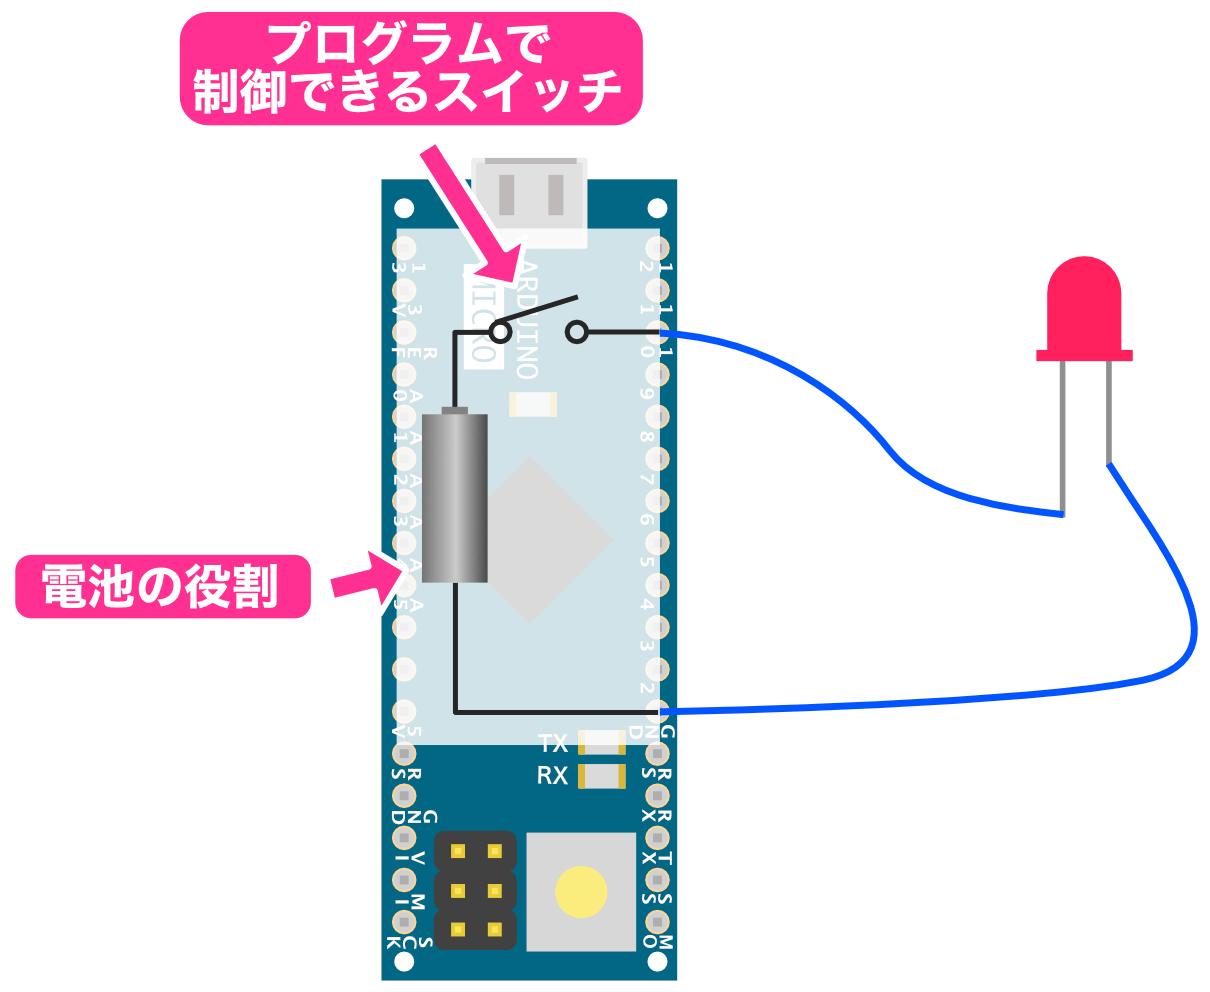 Arduinoの内部説明図